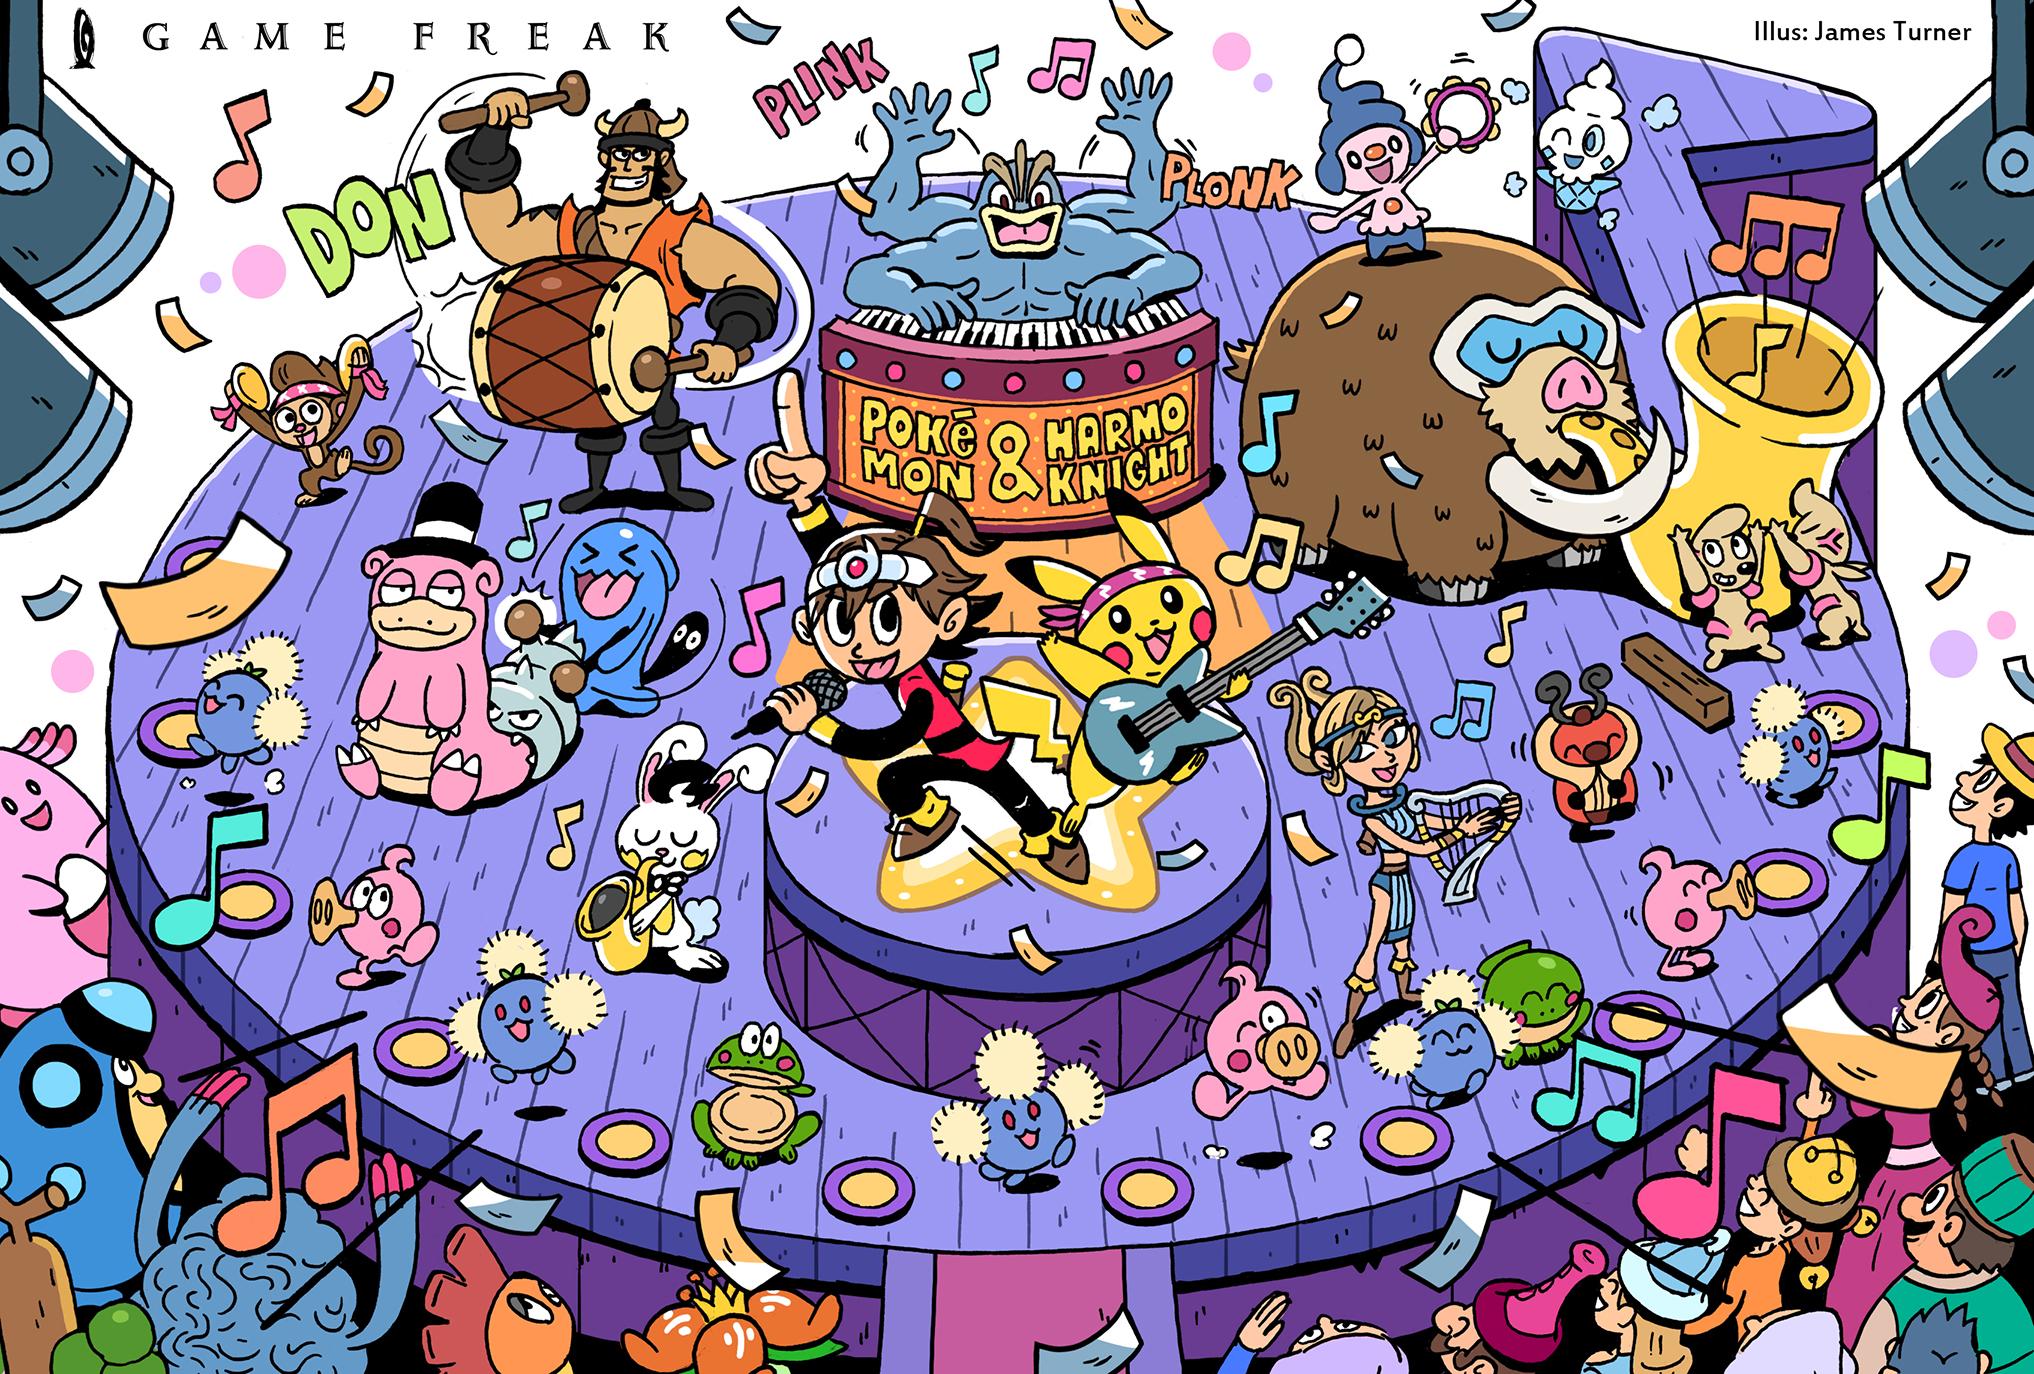 Game Freak New Year's Card